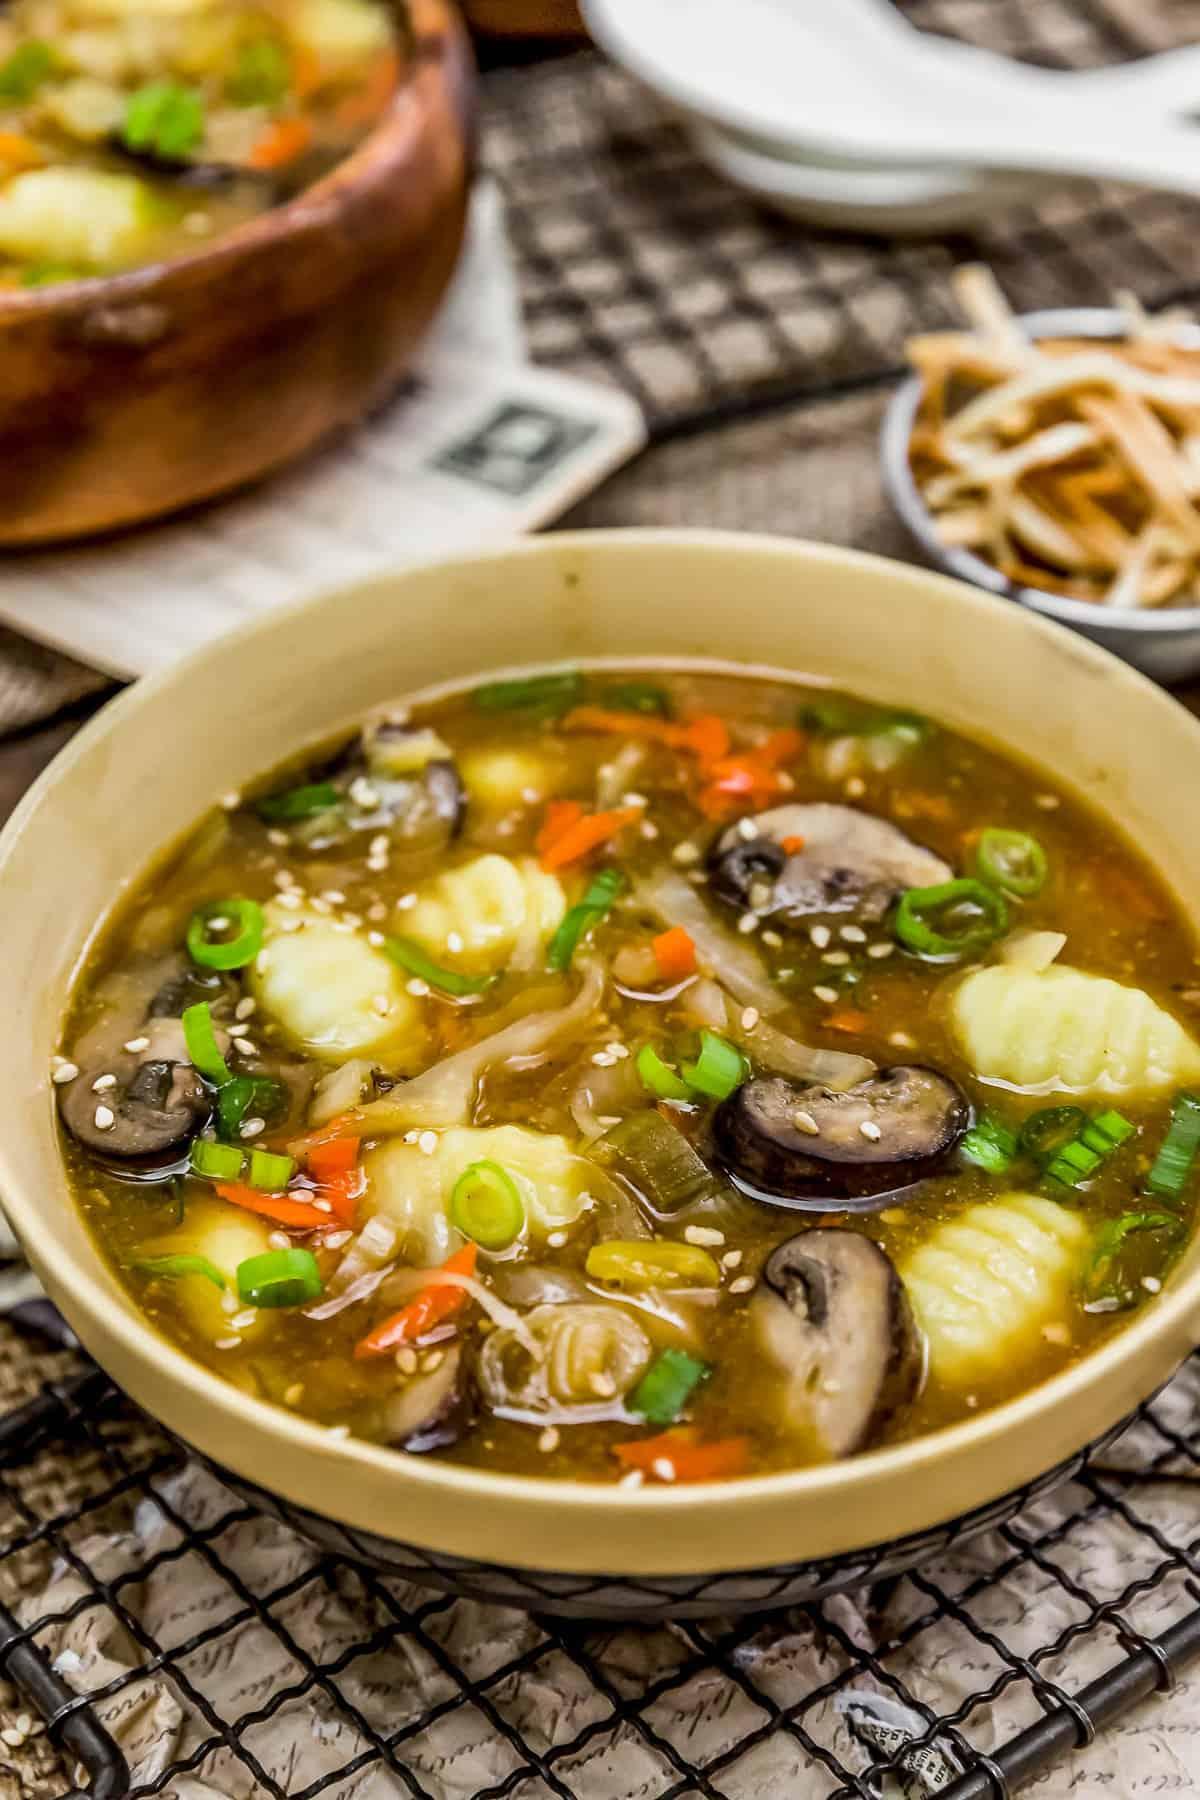 Deconstructed Vegan Wonton Soup in a bowl